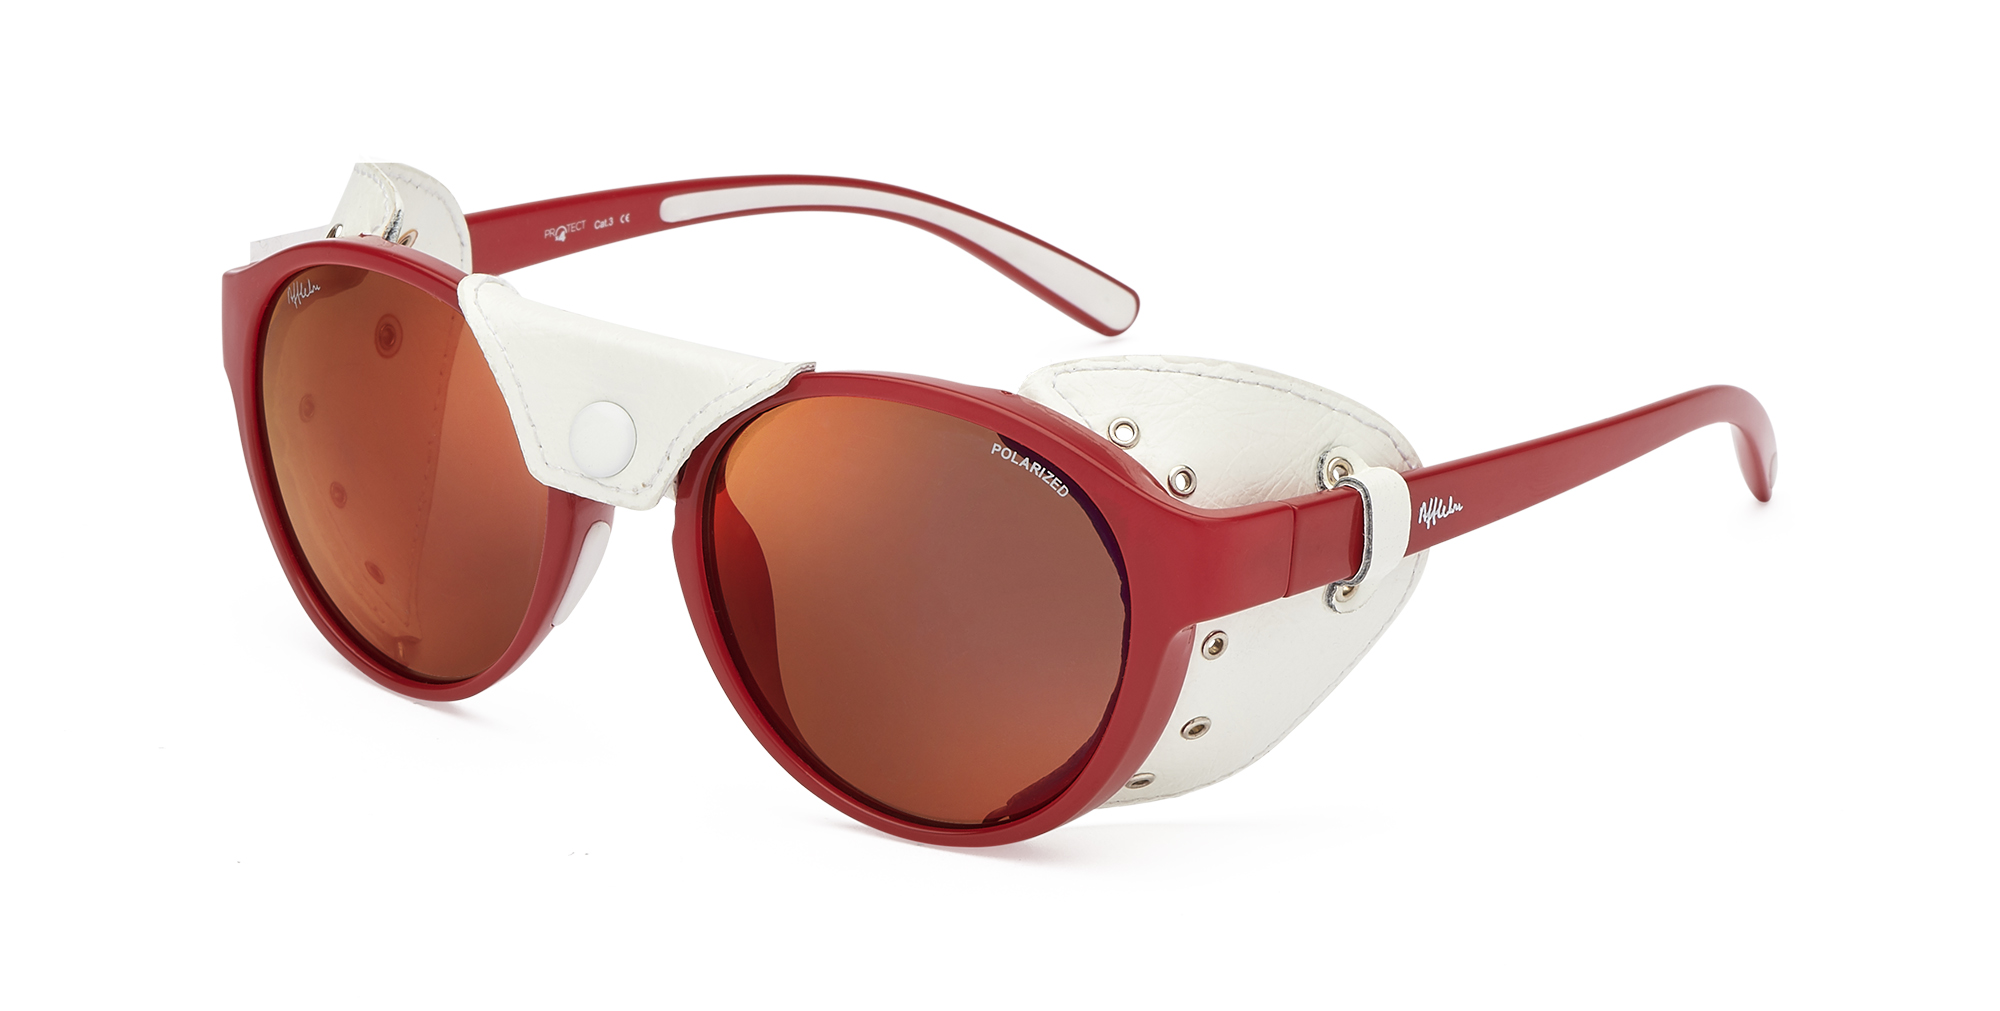 279379f434 Alain Afflelou presenta su gama de gafas para la nieve - Optimoda